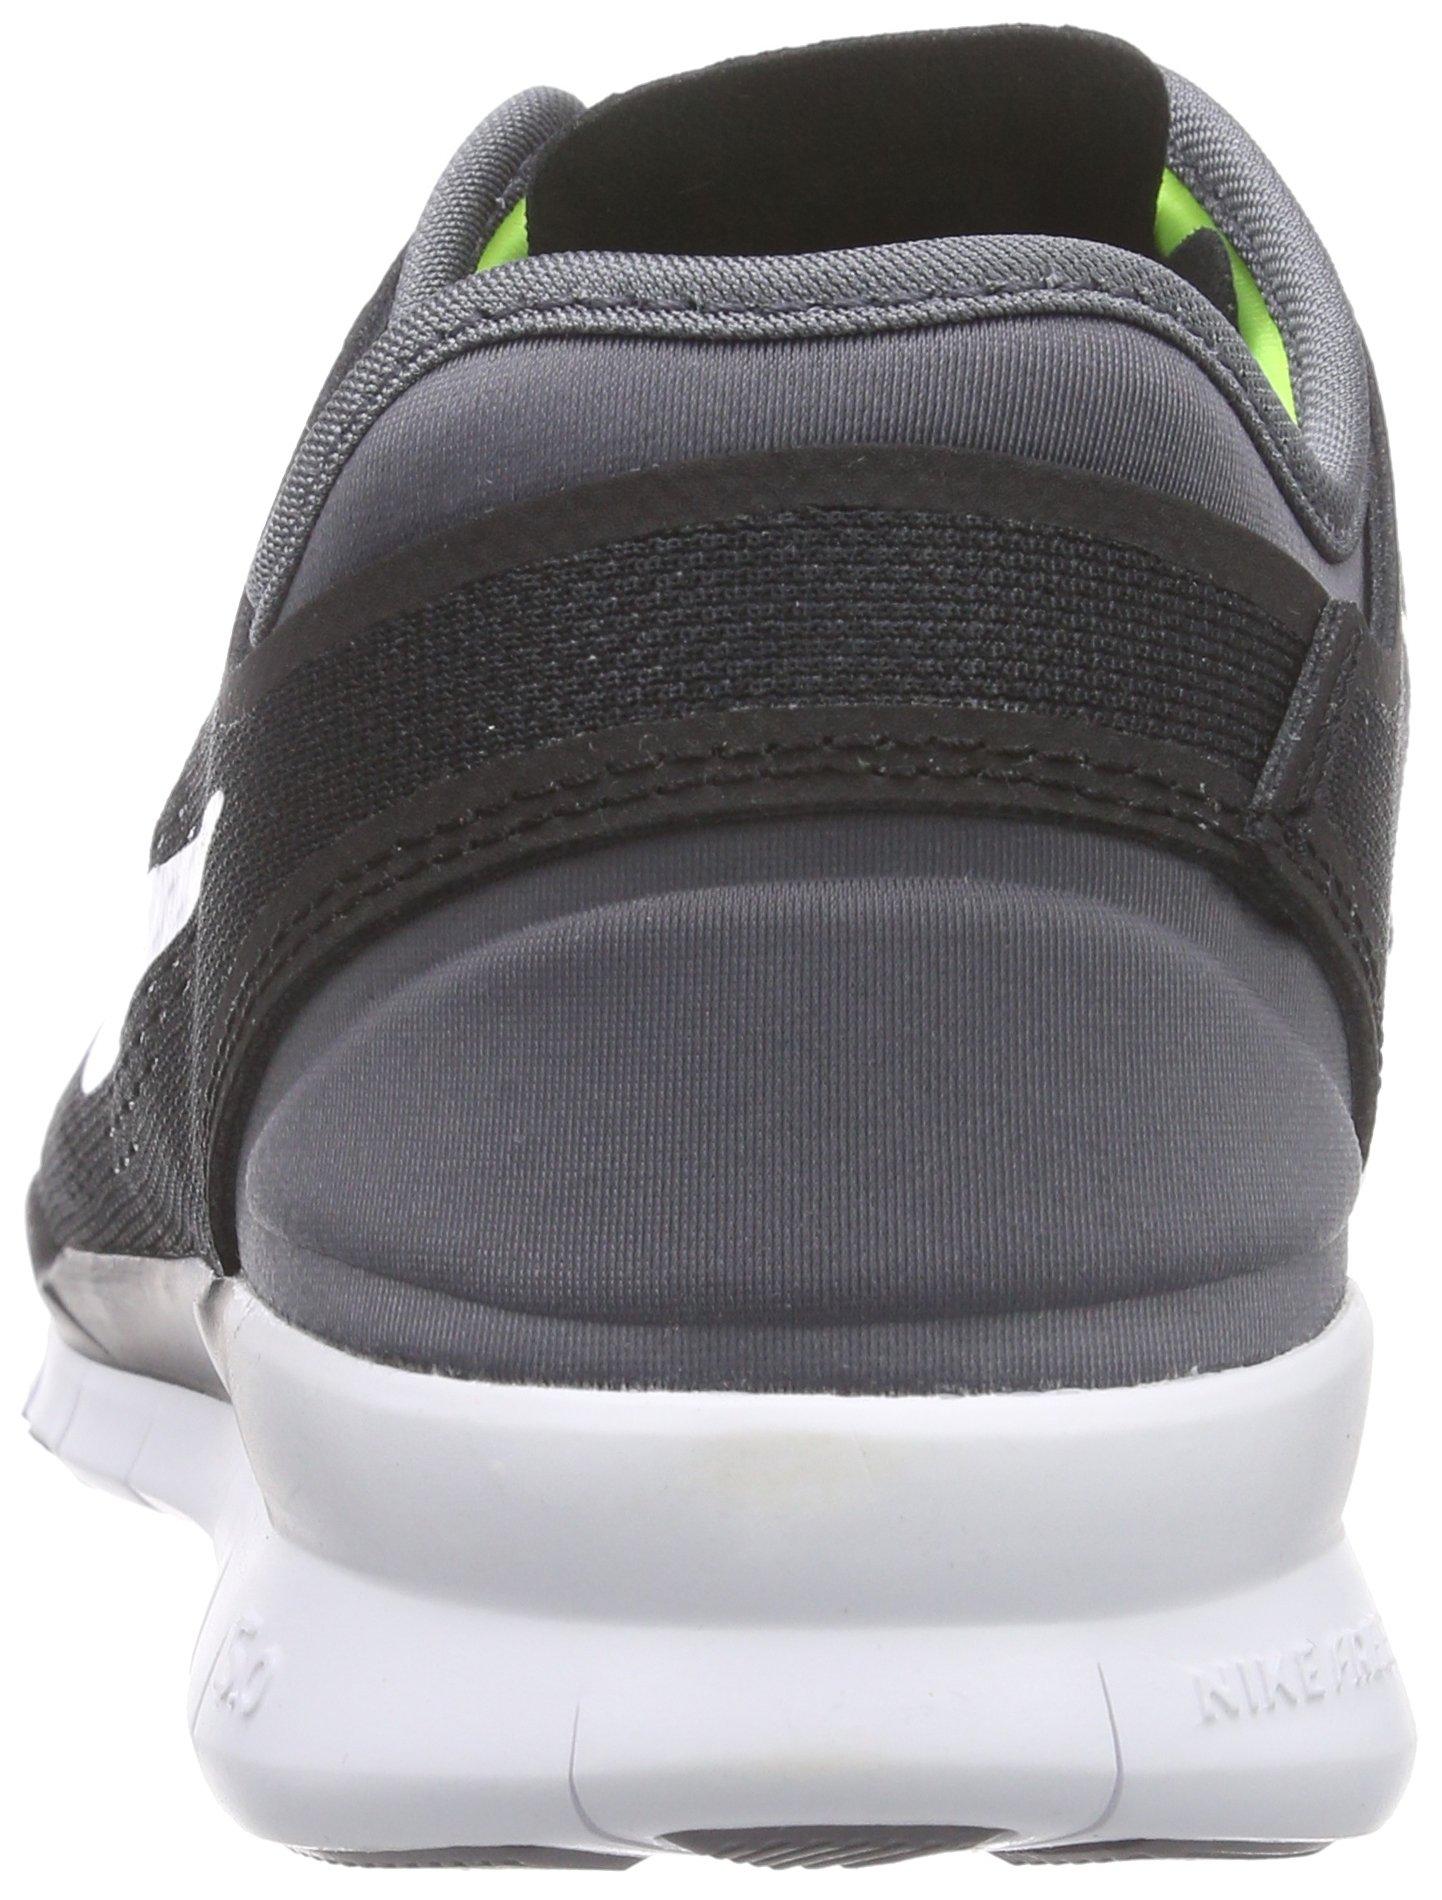 Nike Womens Free 5.0 Tr Fit 5 Black/White/Dark Grey/White Training Shoe 5 Women US by Nike (Image #2)